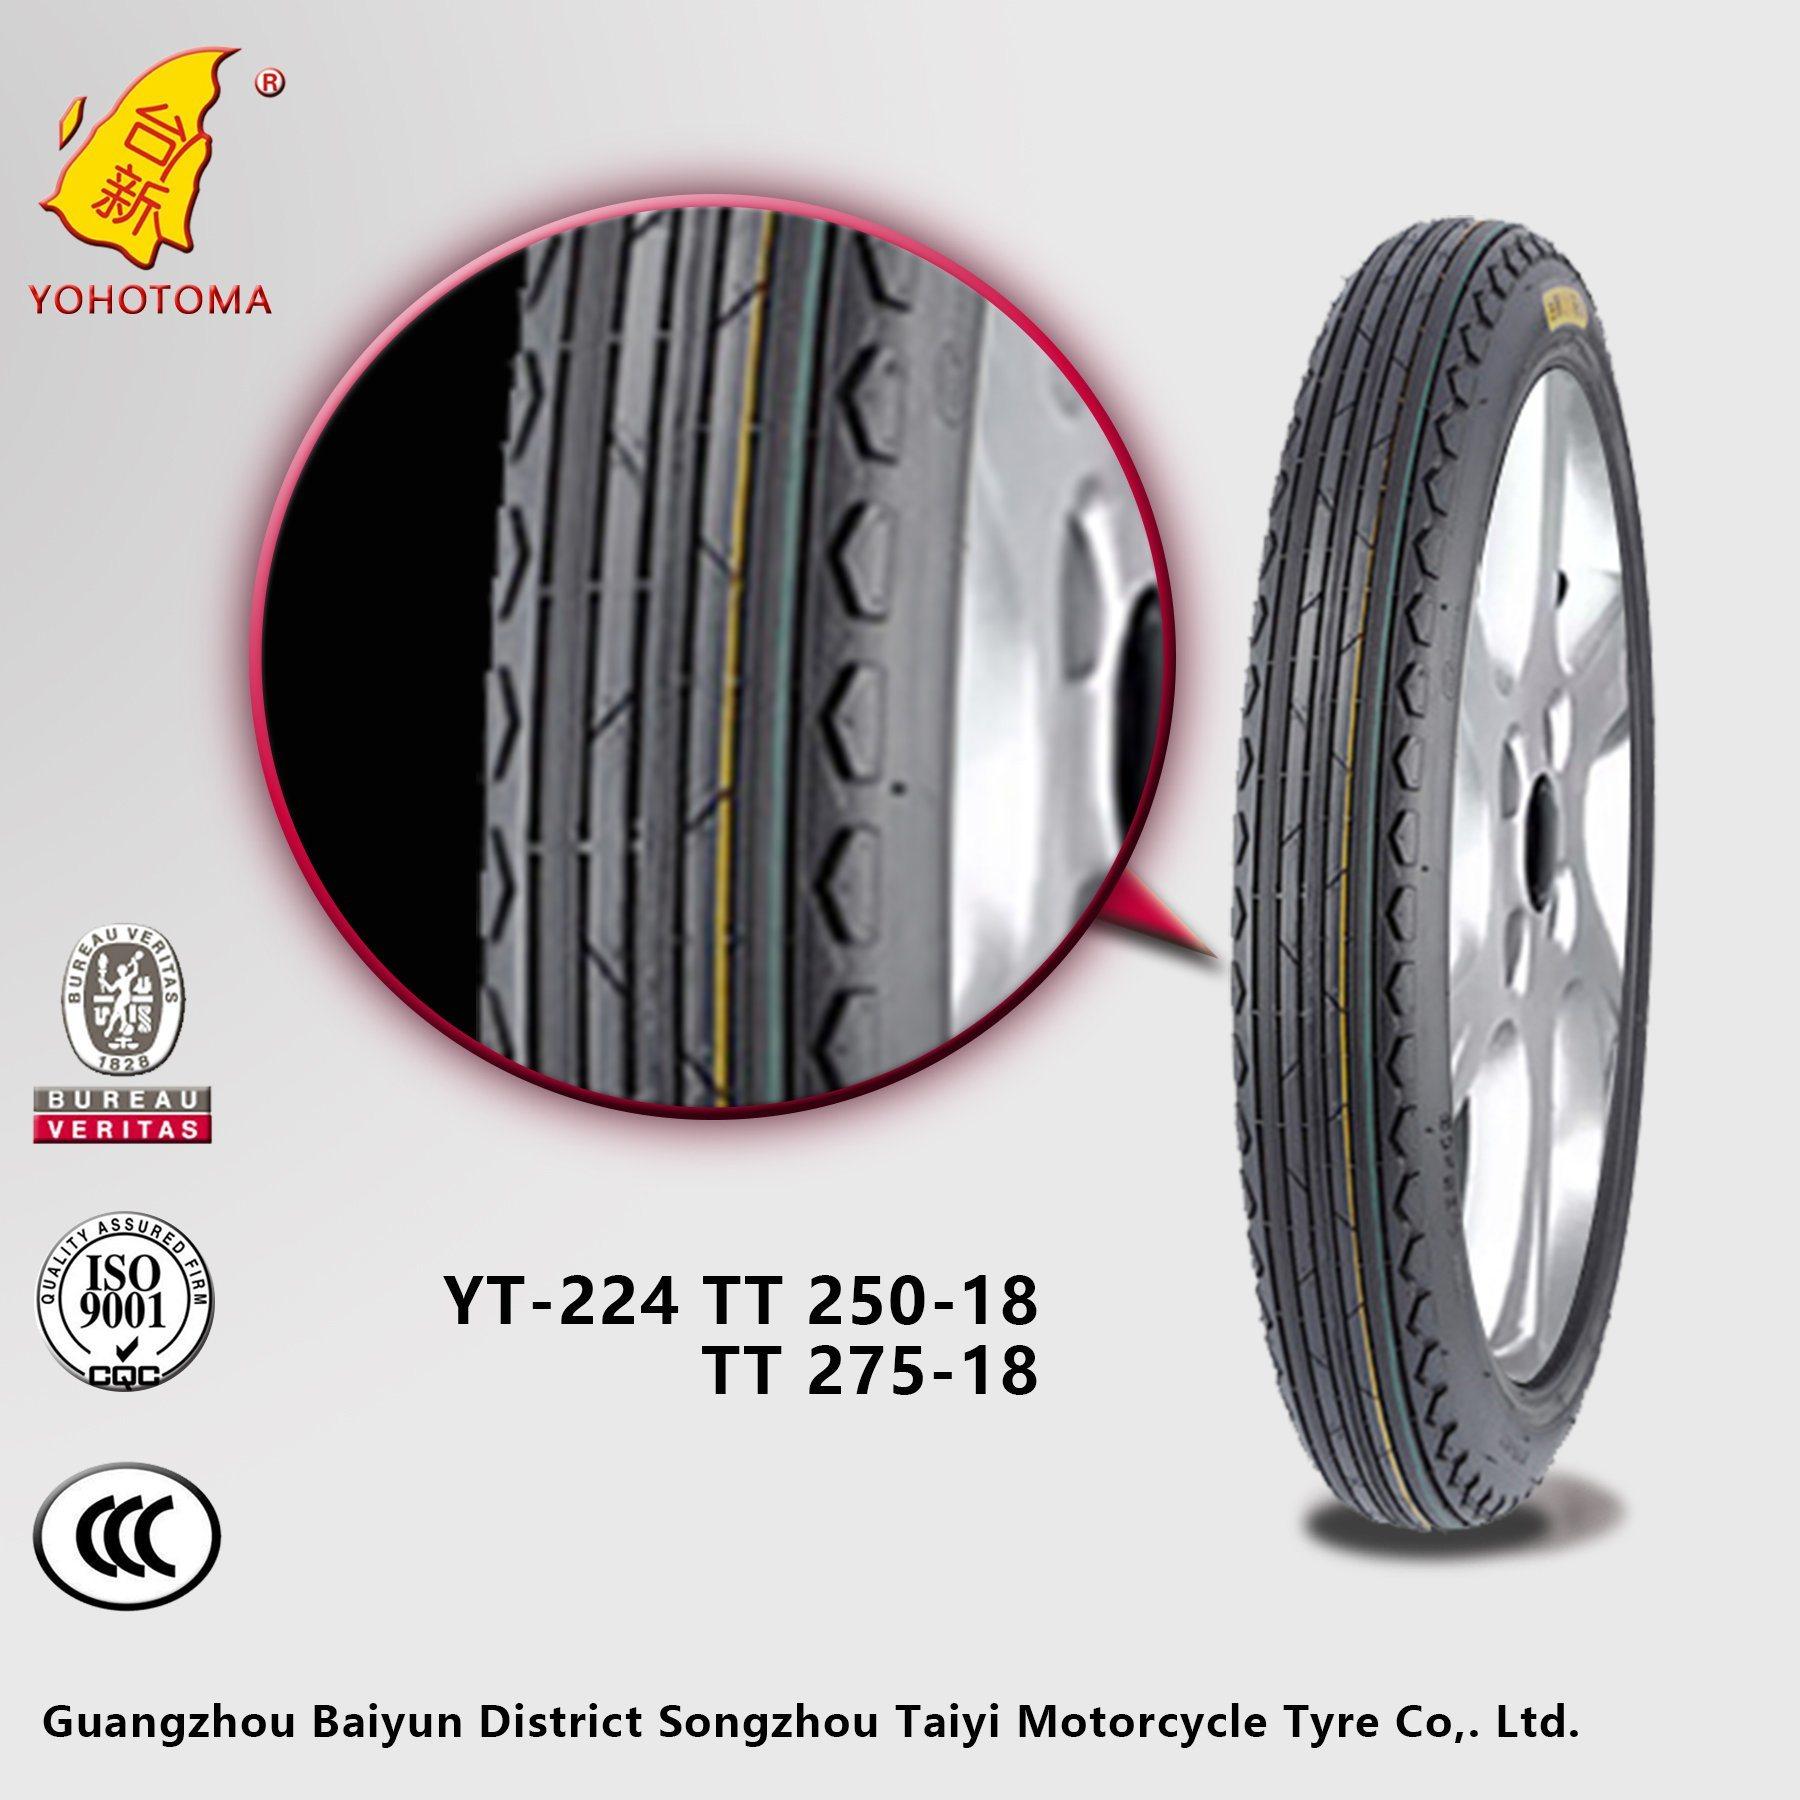 China Factory Low Price Supply Motor Tyre 250-18 YT-224 TT